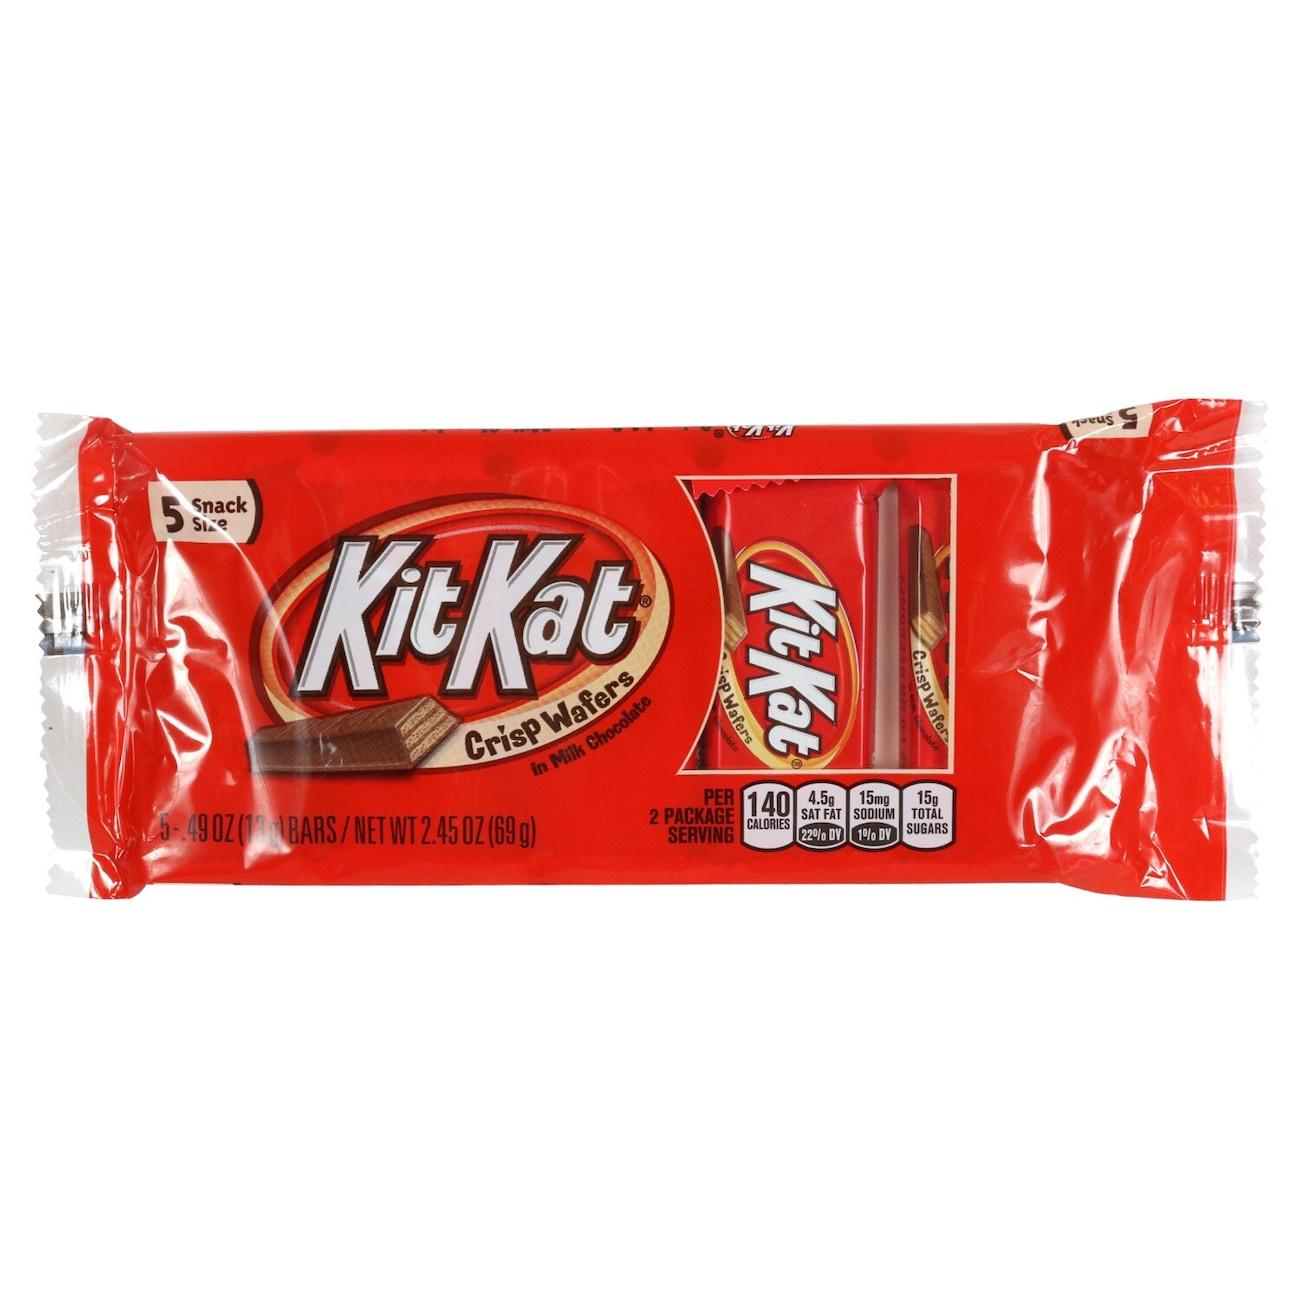 Kit Kat - Dollar Tree, Inc.